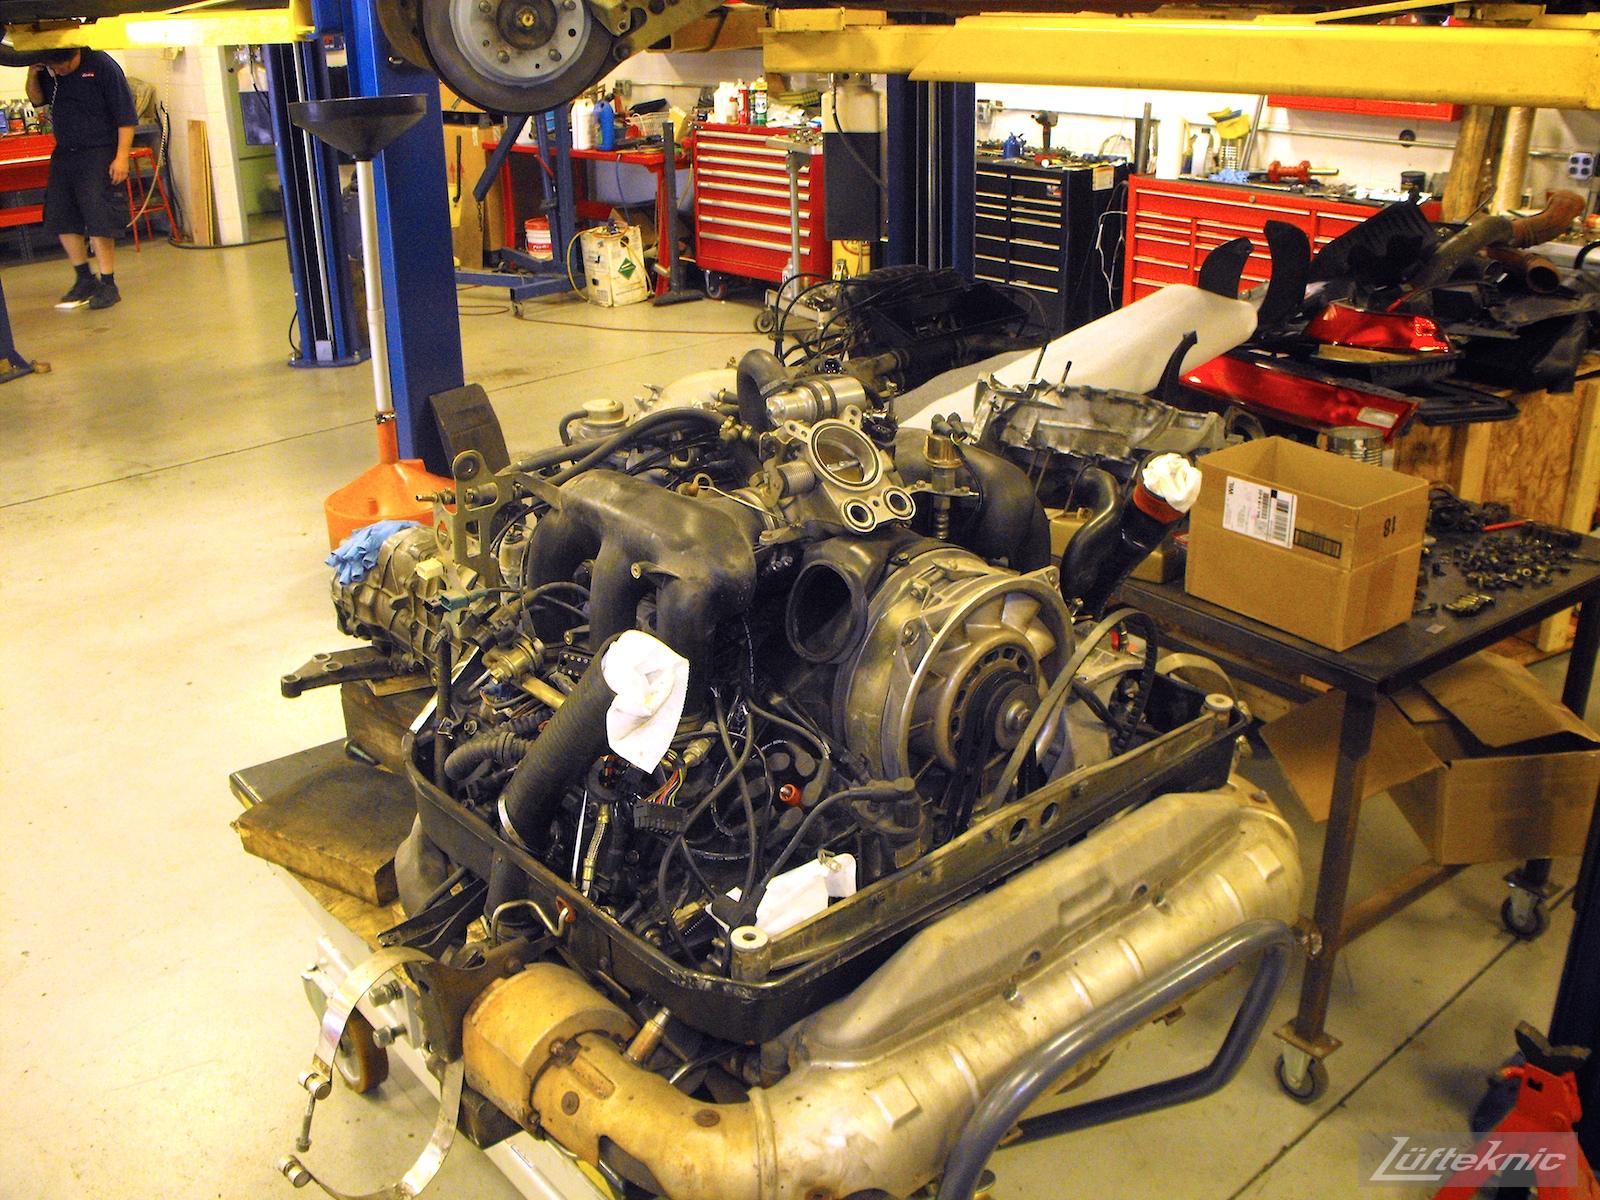 A Porsche 993TT engine on the engine table at Lufteknic.